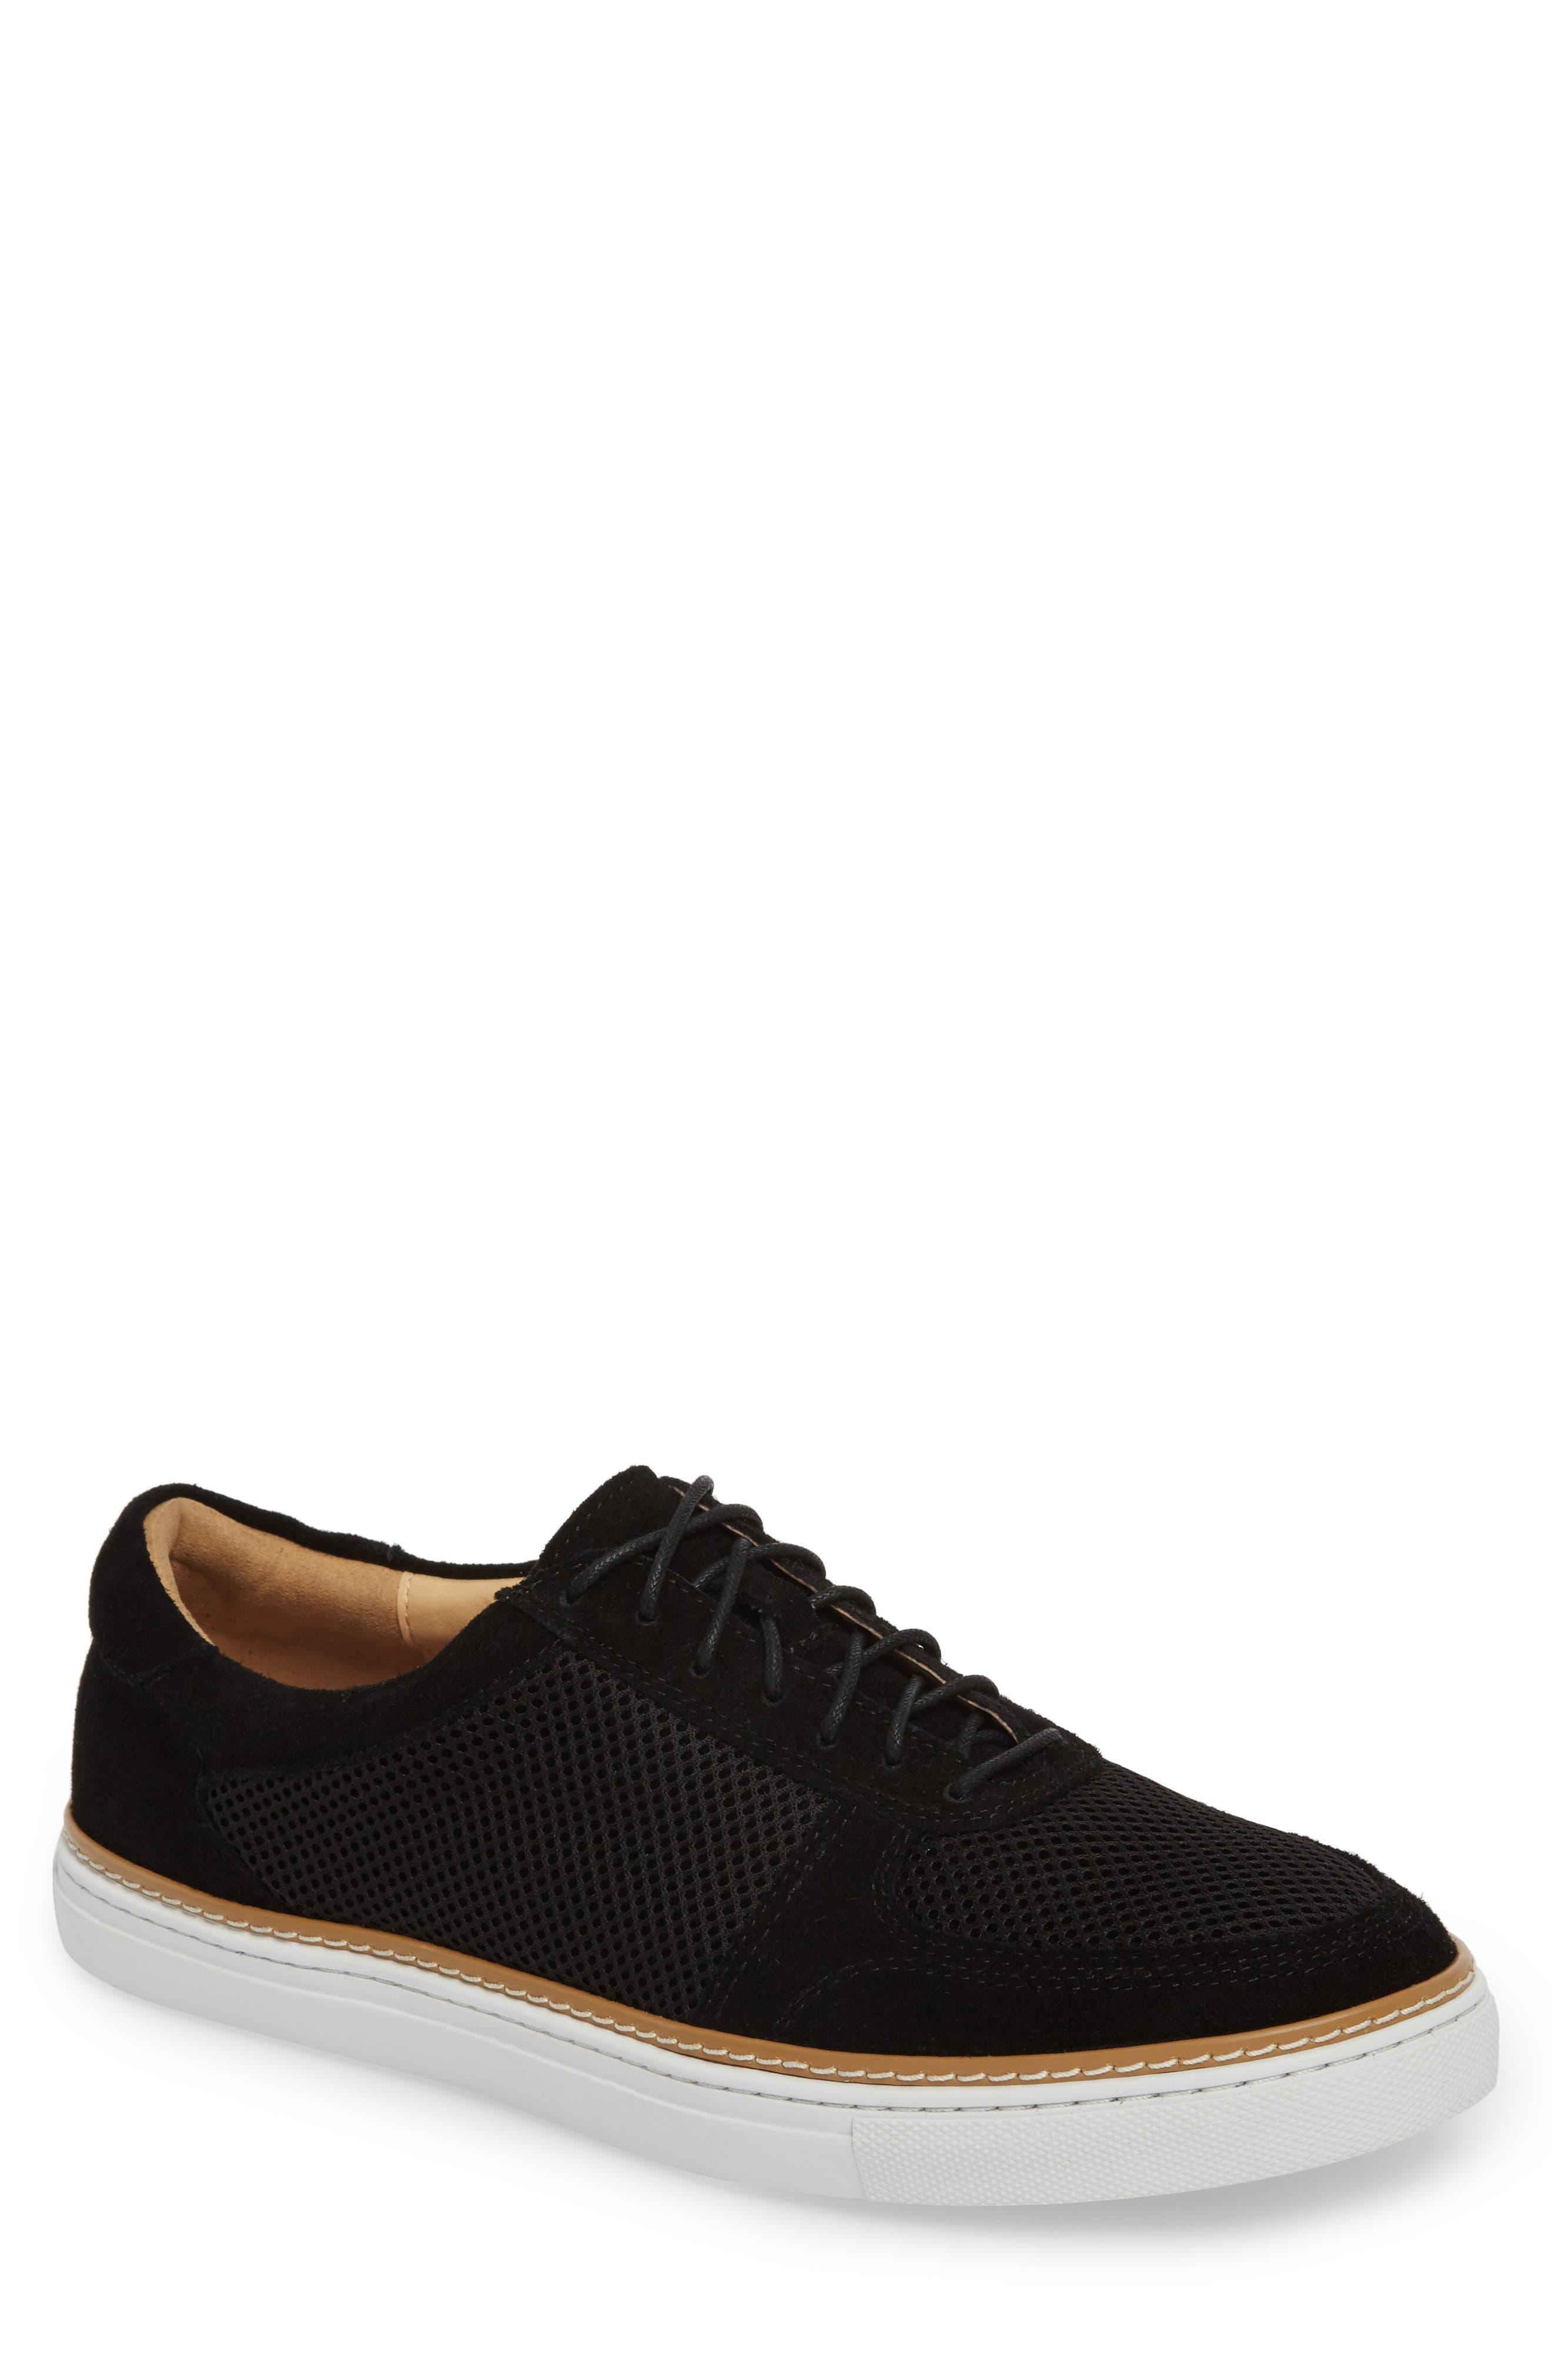 Landseer Mesh Sneaker,                             Main thumbnail 1, color,                             BLACK SUEDE/ MESH